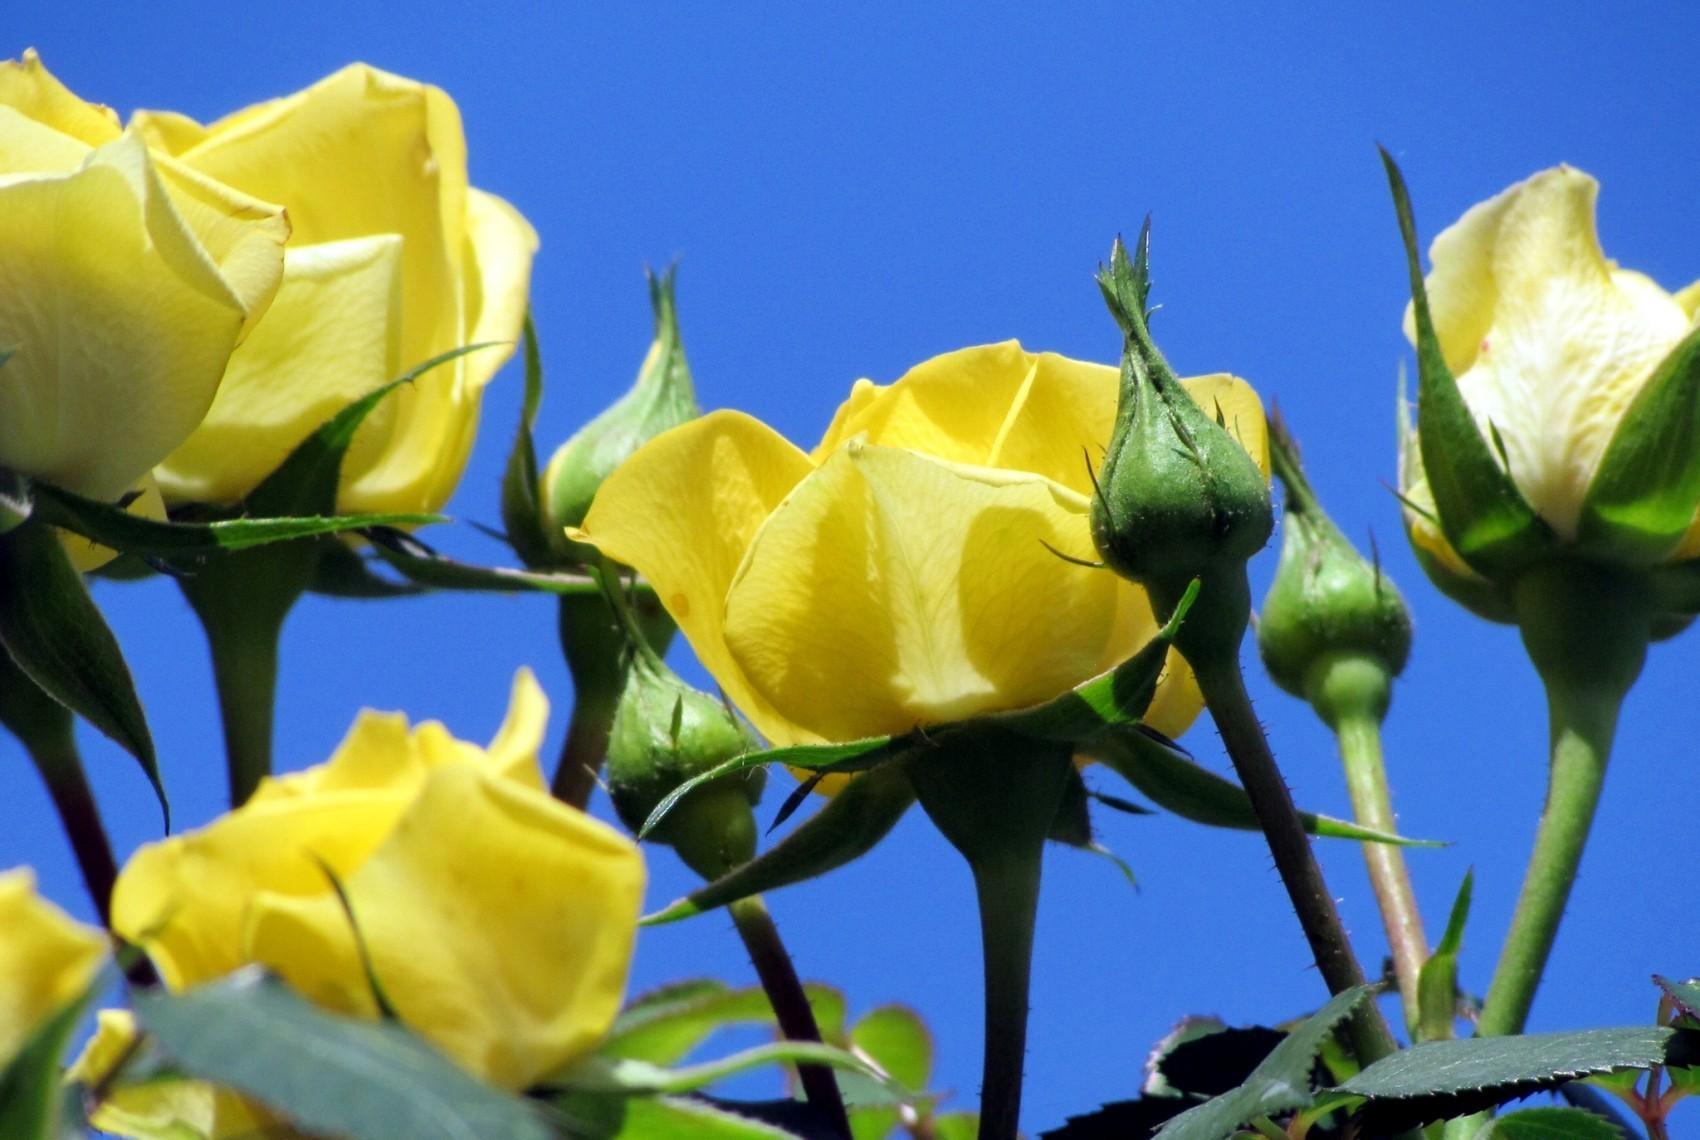 Wallpaper Flowers Sky Yellow Blue Flower Flora Bud Petal